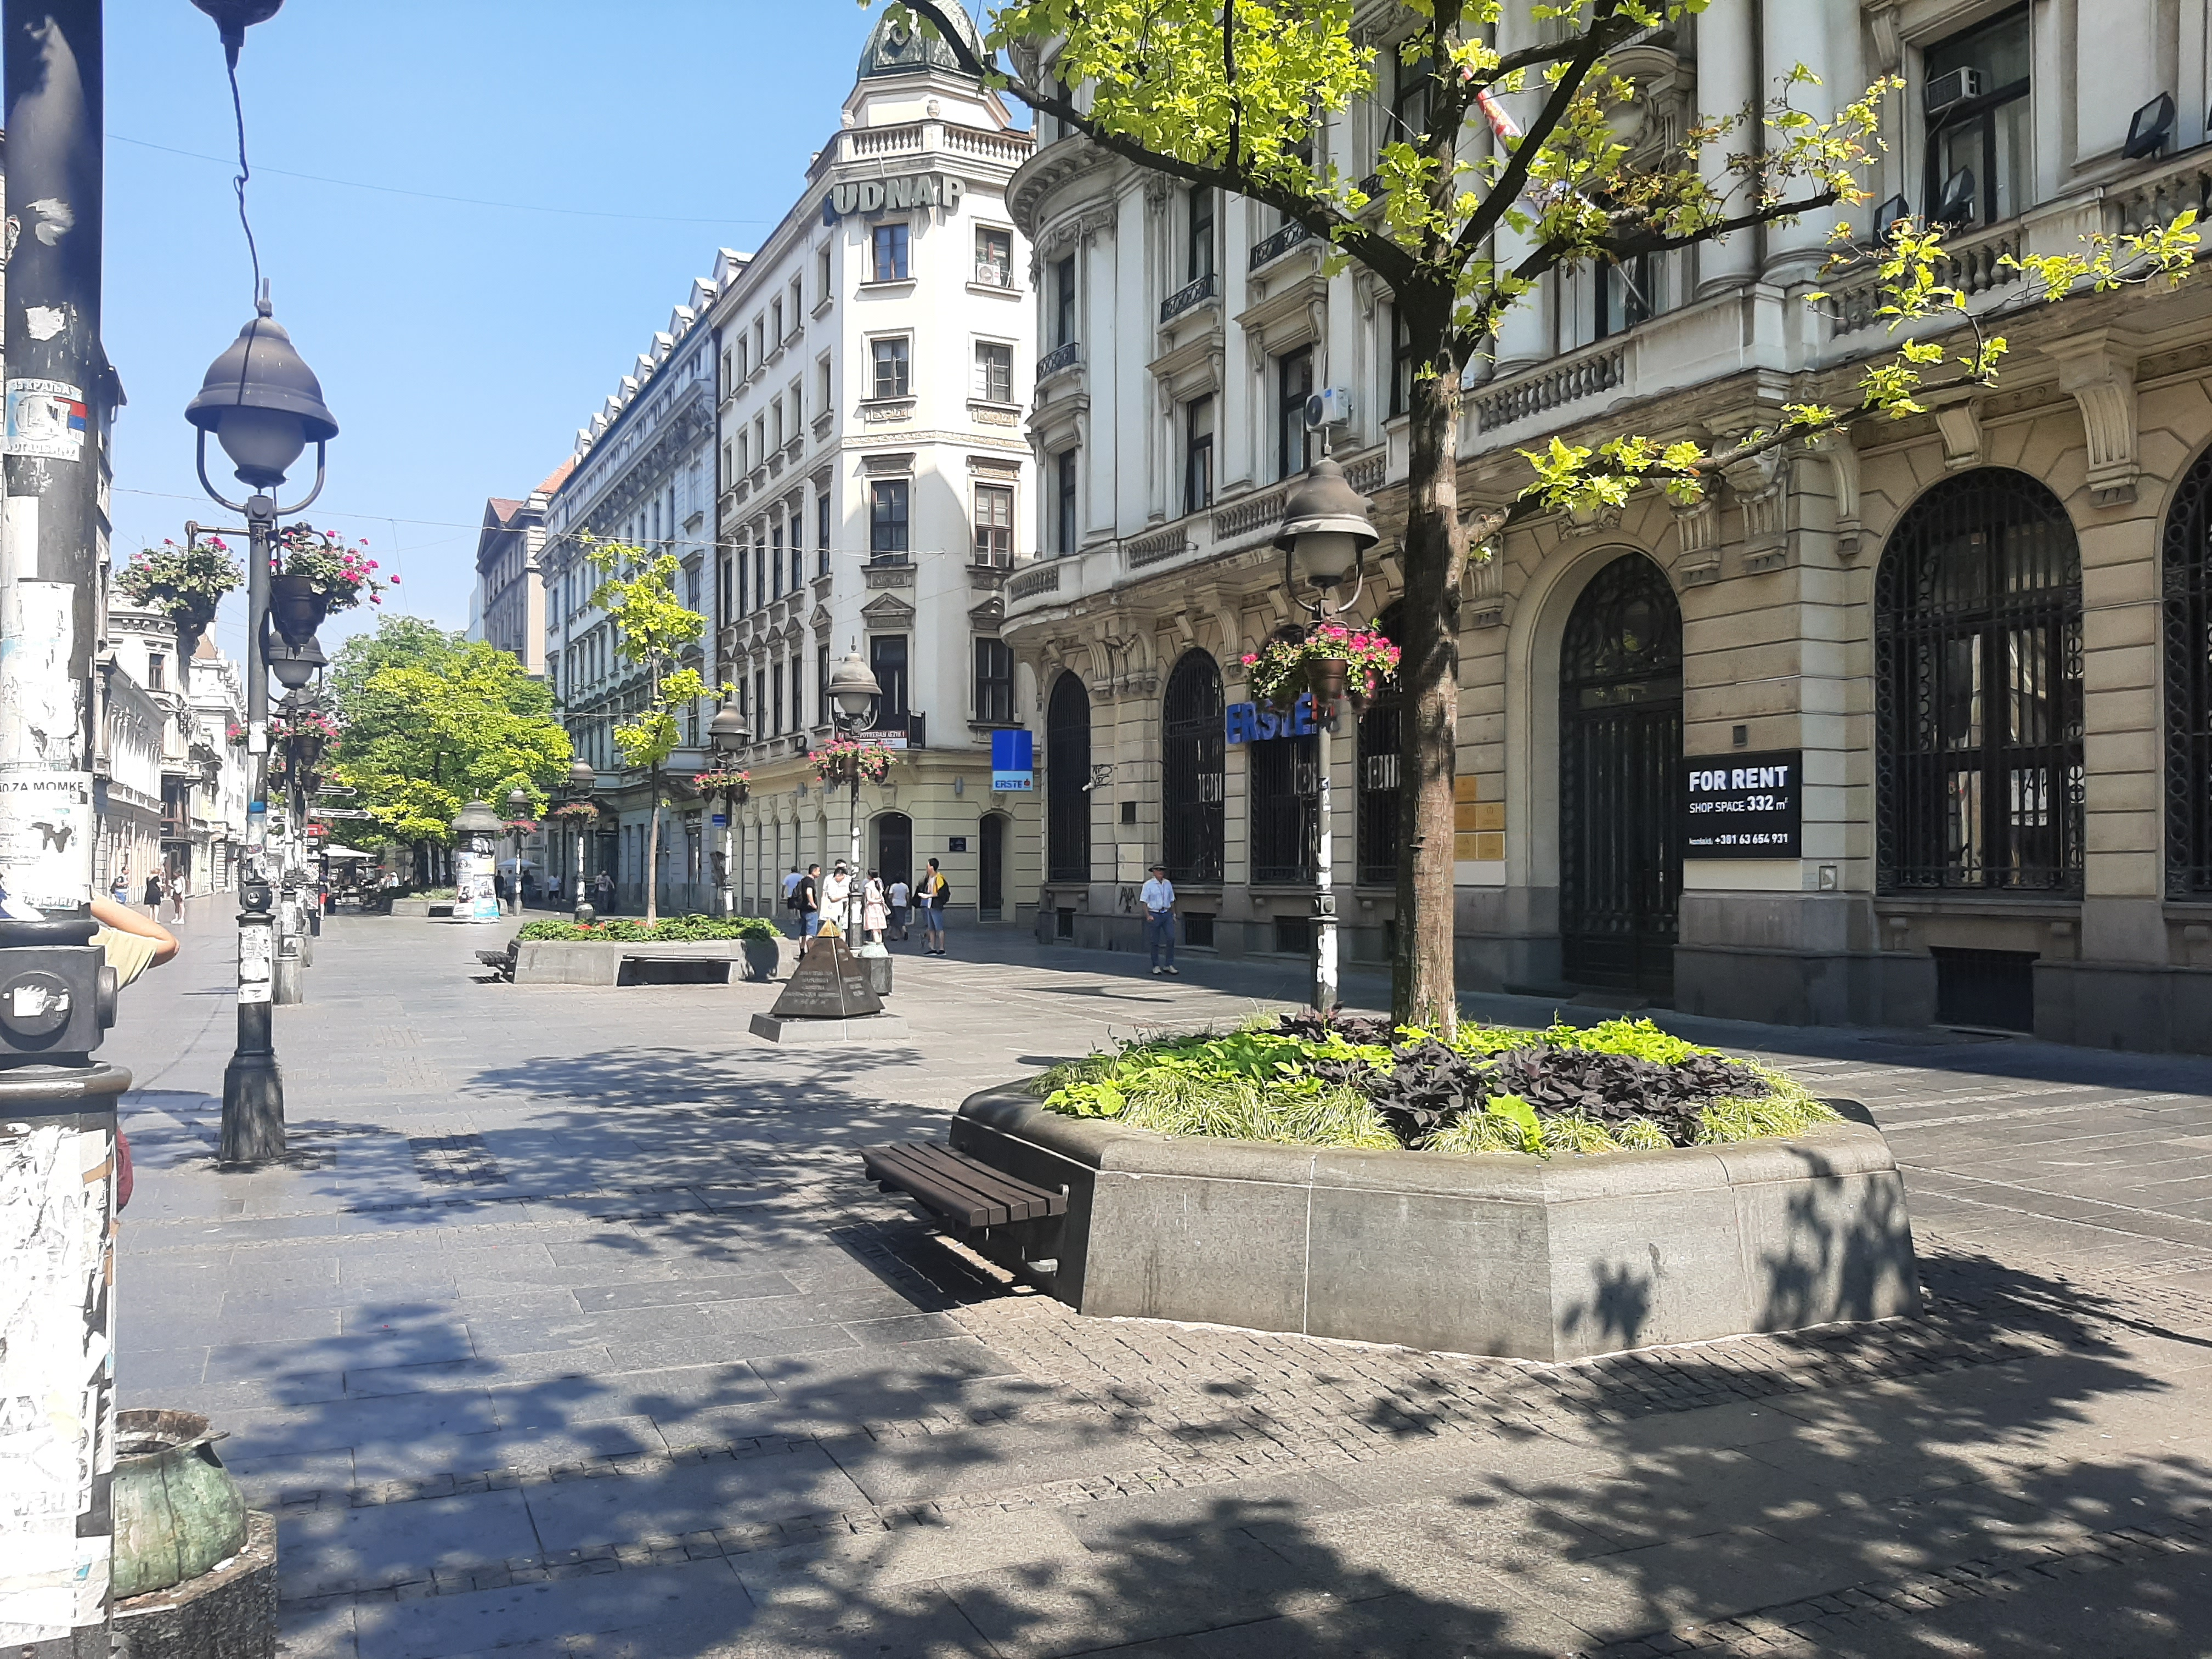 20190721_Belgrado117.jpg